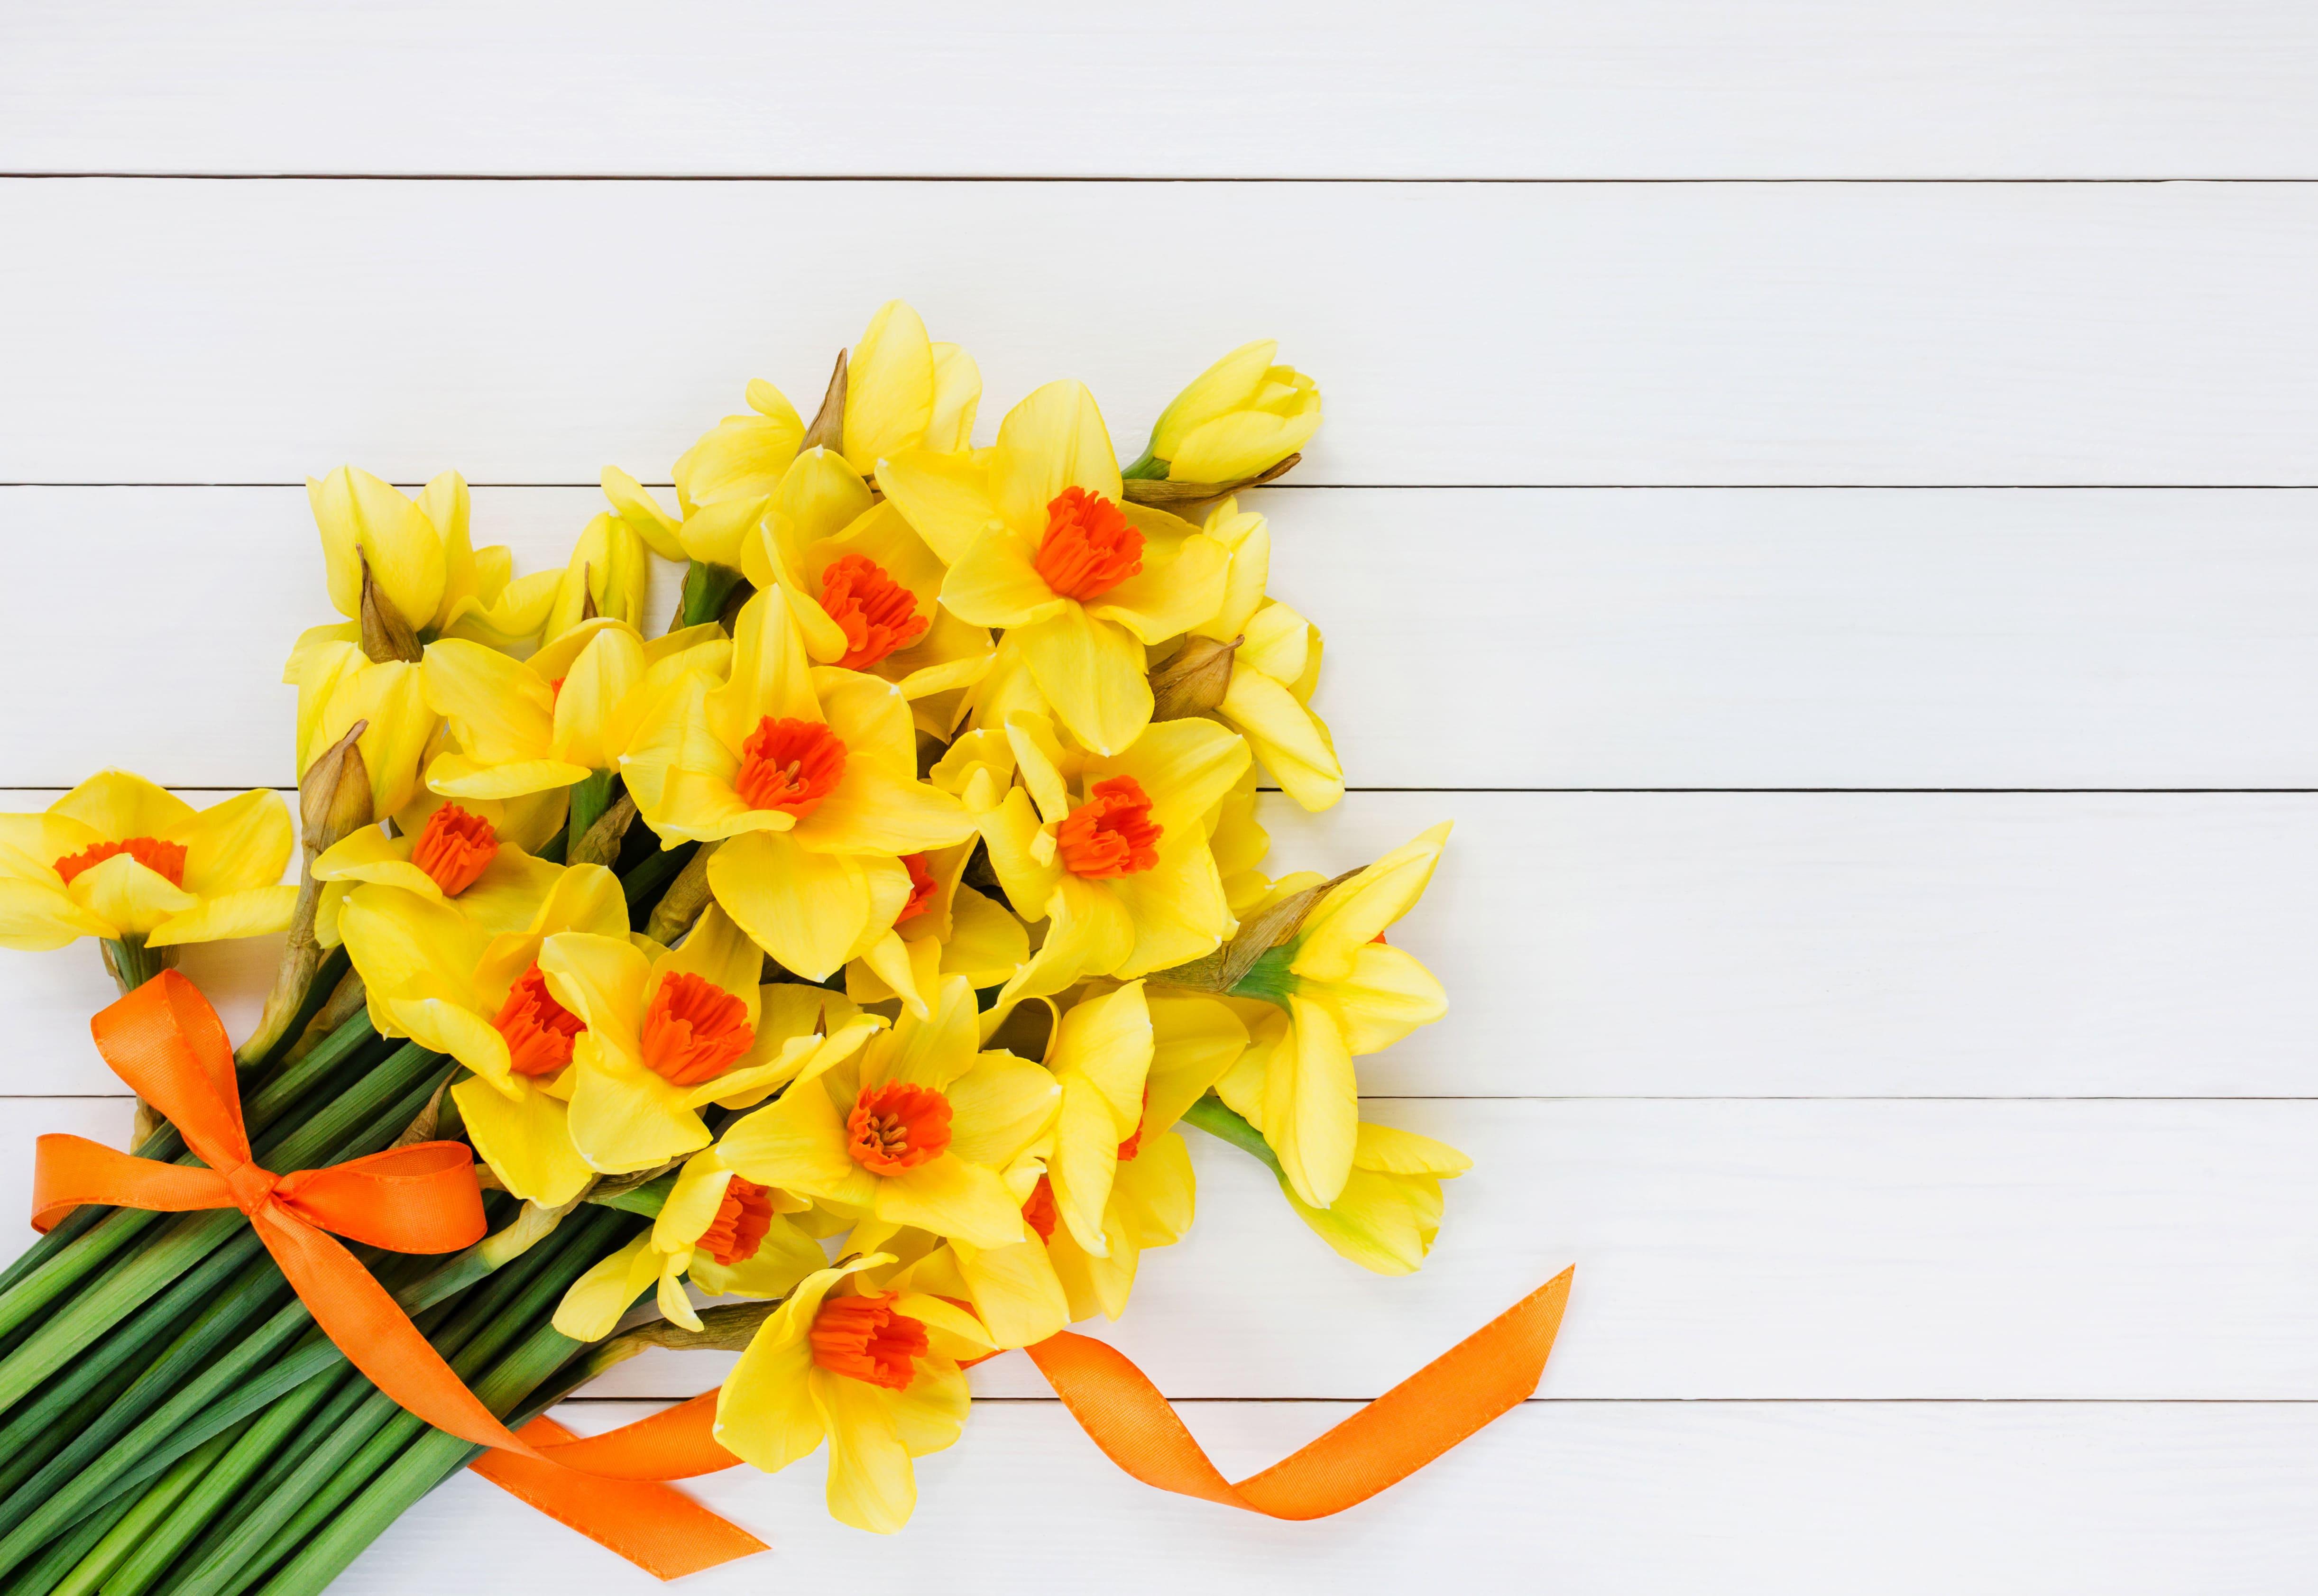 daffodils-photo-36